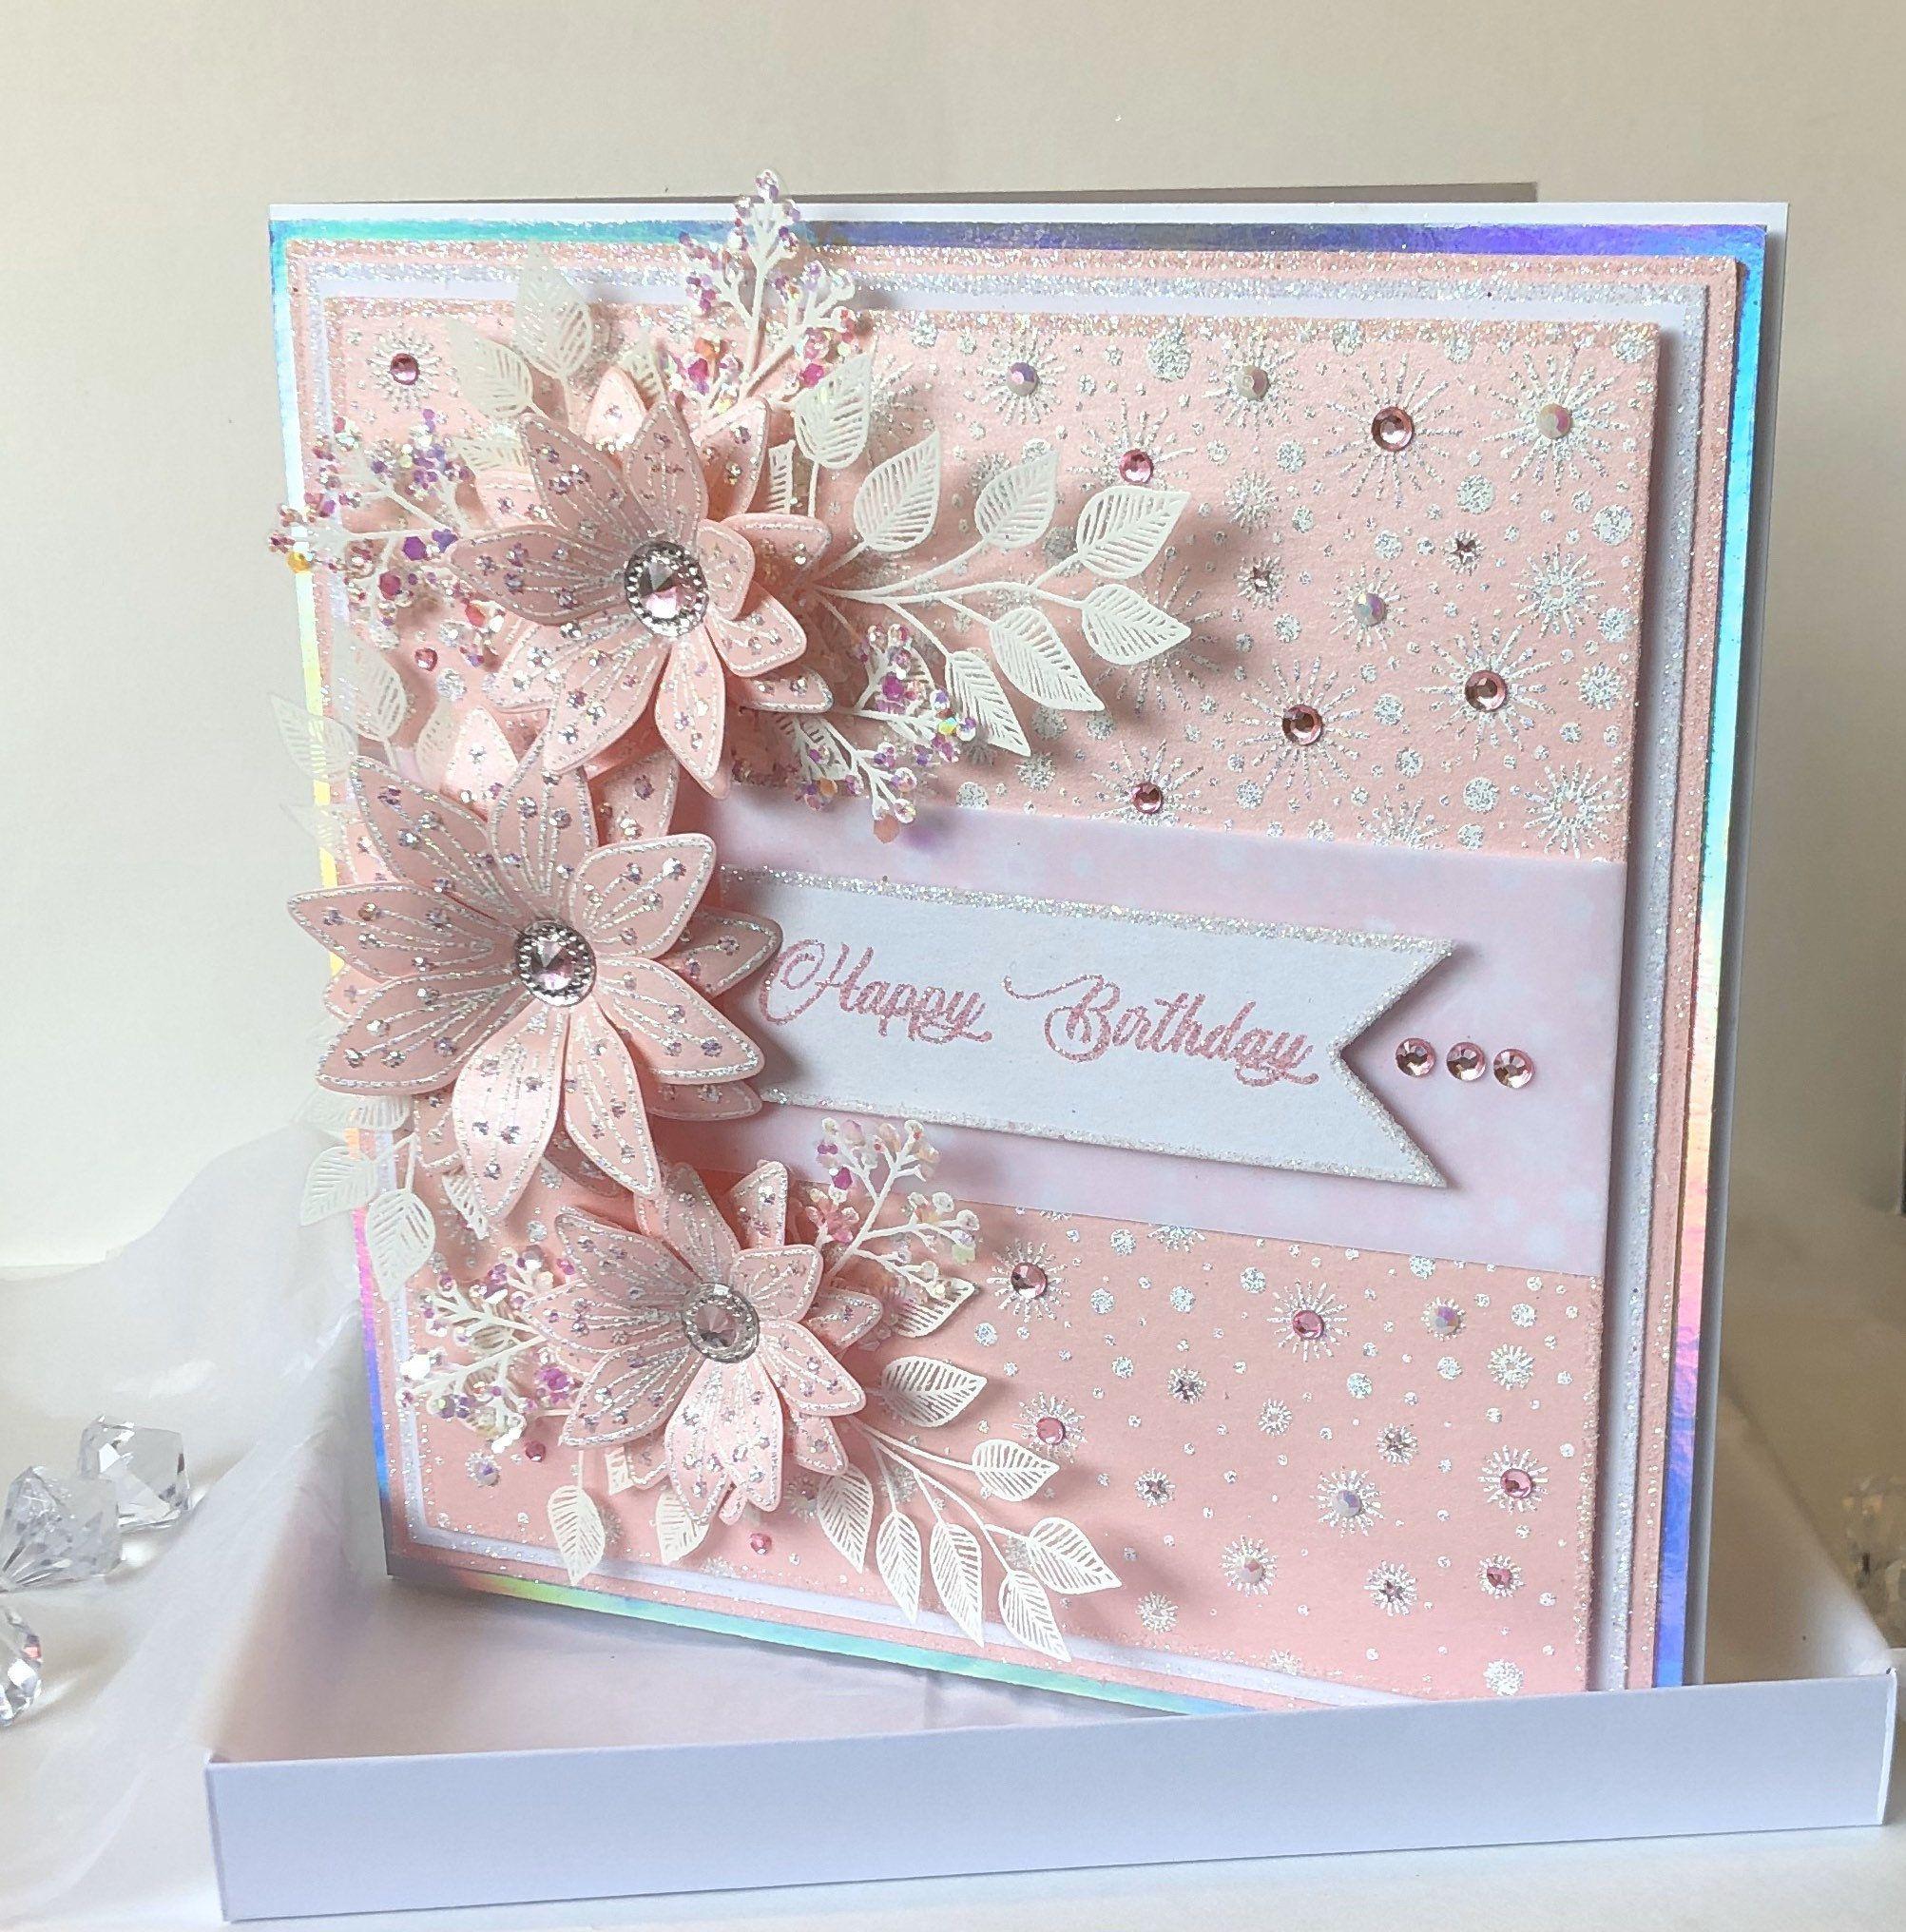 Luxury Handmade Pink Boxed Birthday Card Birthday Boxed Card Handmade Luxury Pink Chloes Creative Cards Luxury Birthday Cards Stamps By Chloe